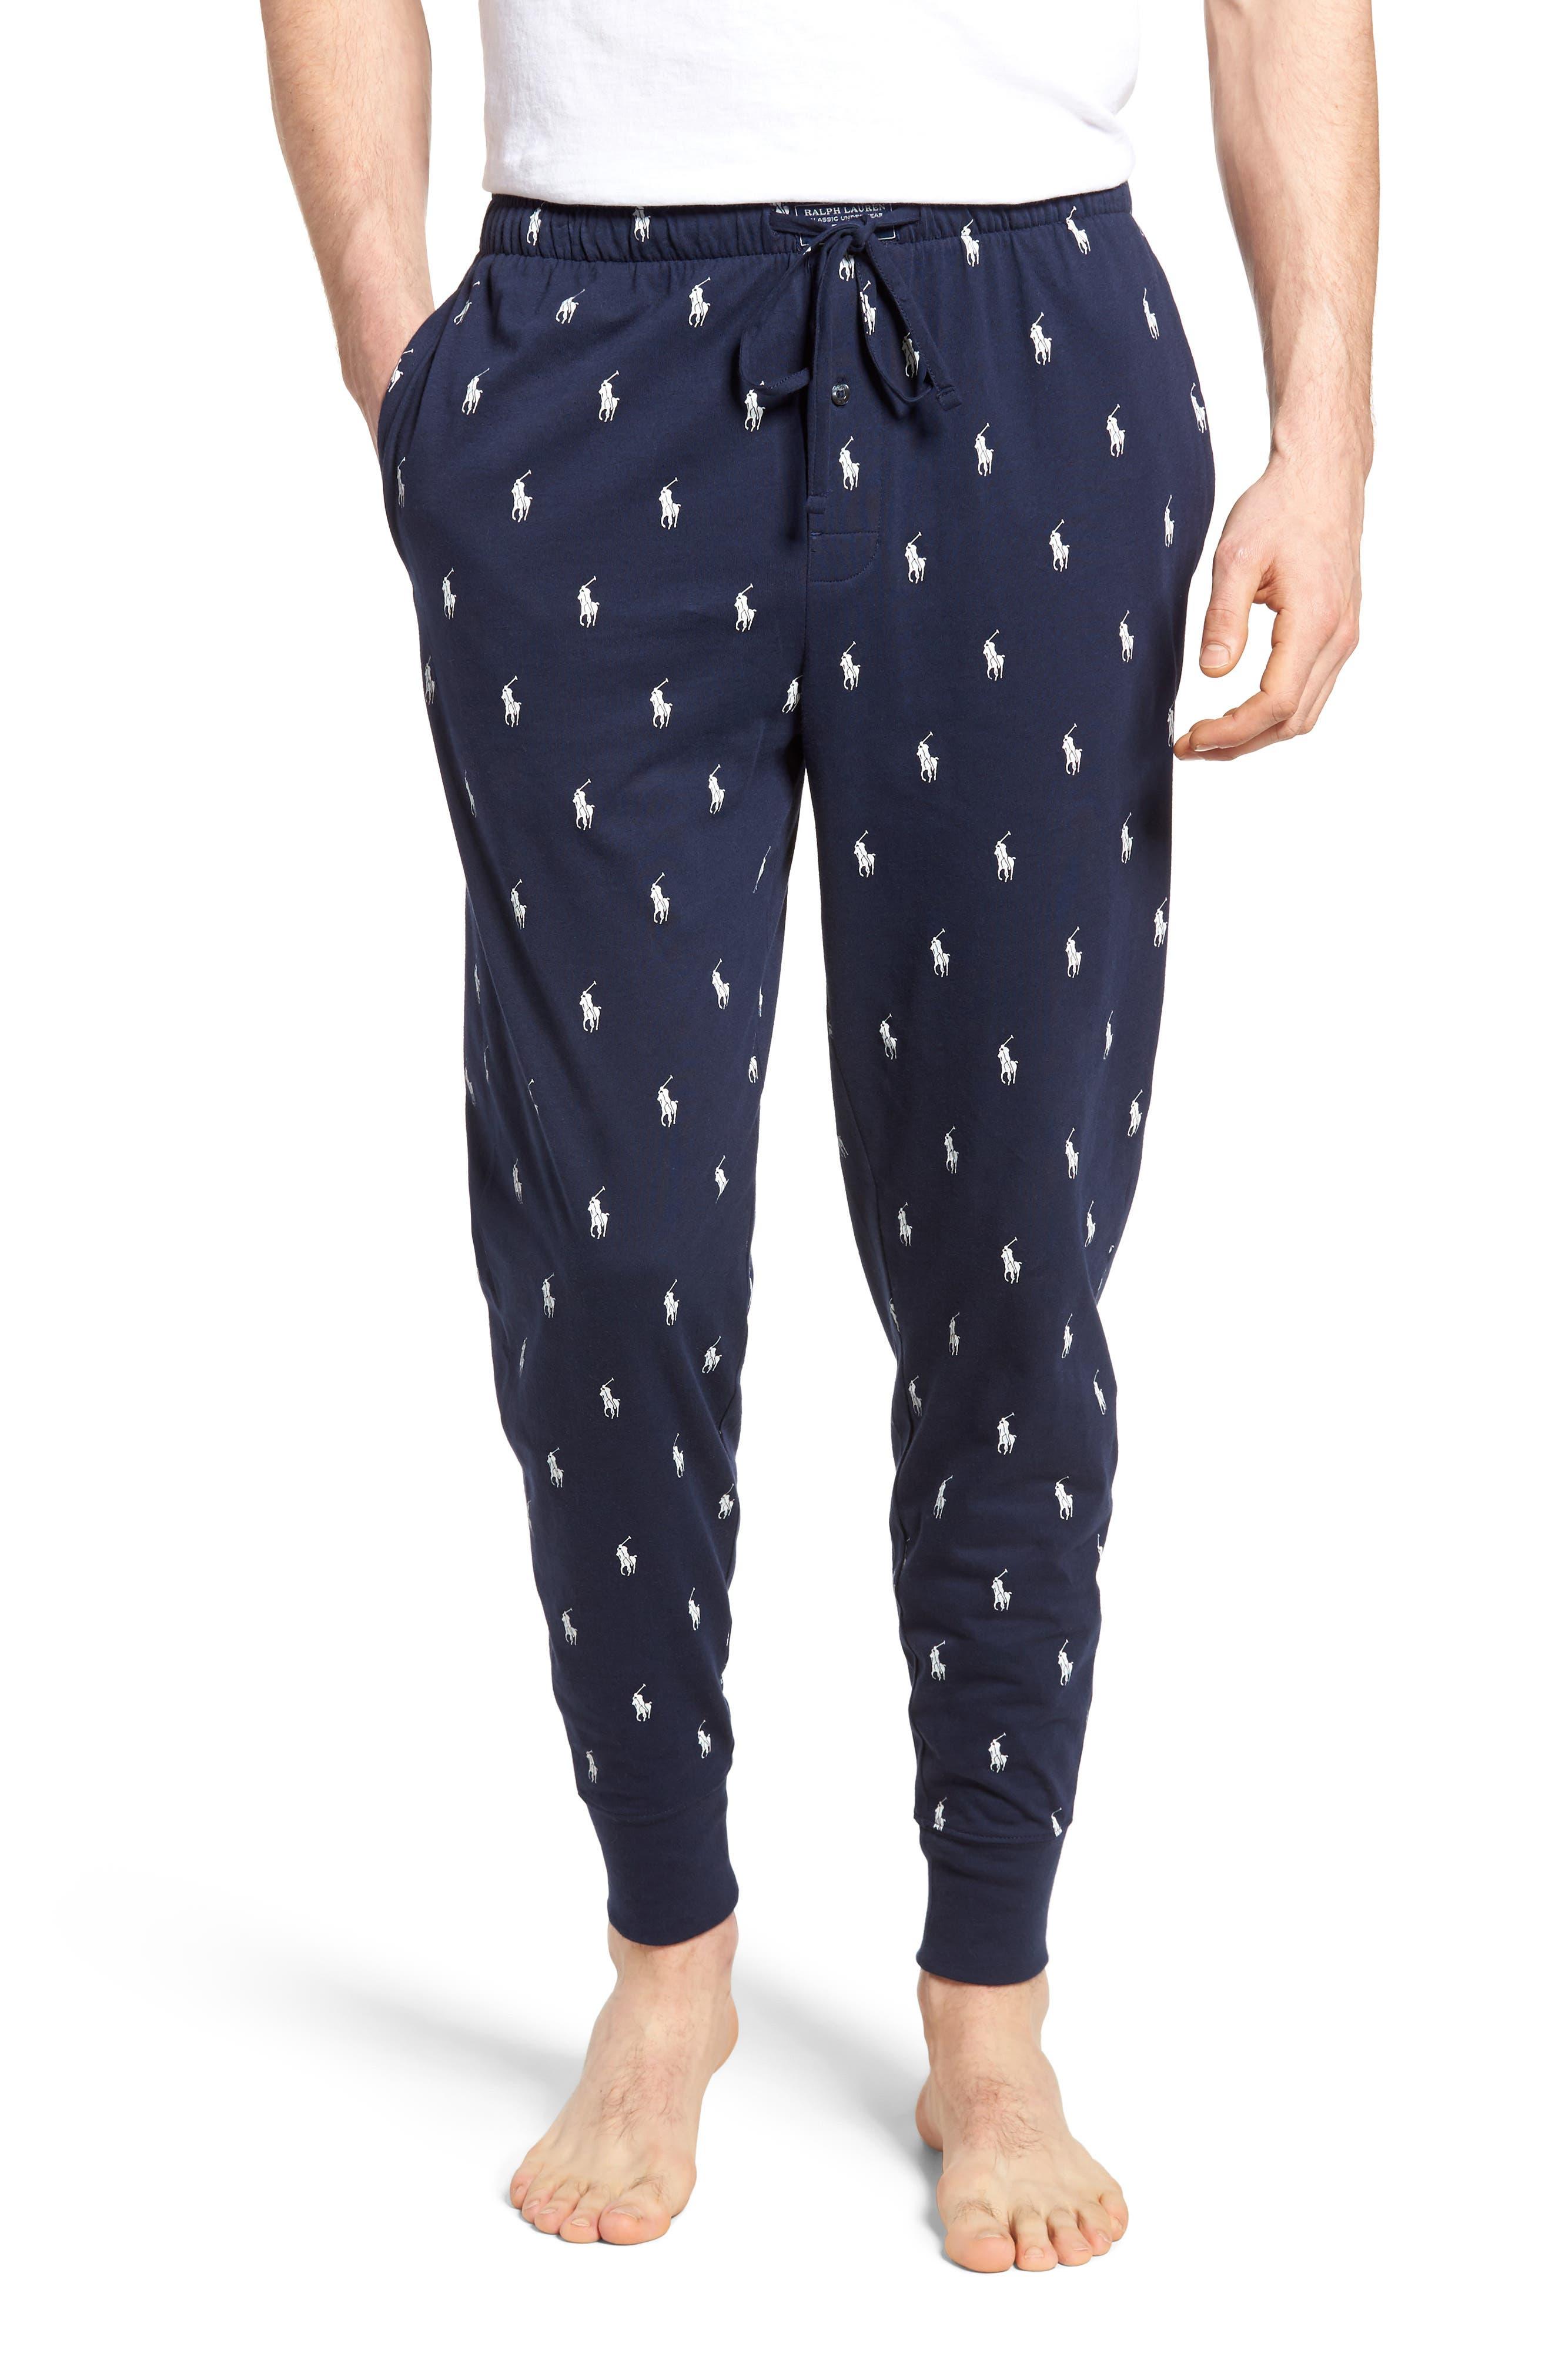 Polo Ralph Lauren Pony Print Lounge Pants